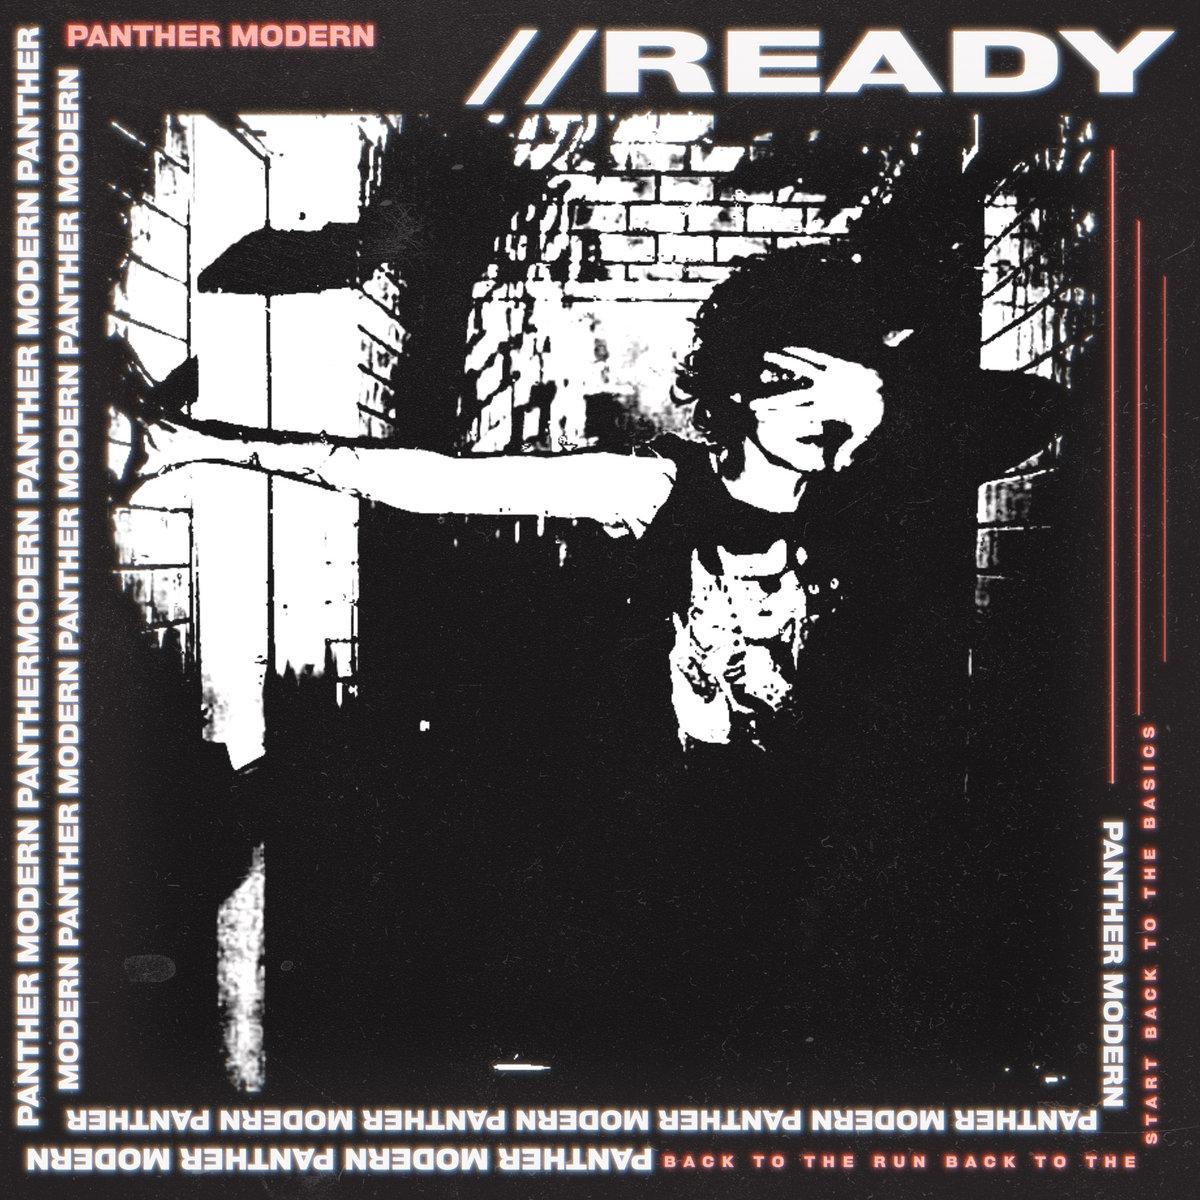 STREAM: Panther Modern - READY